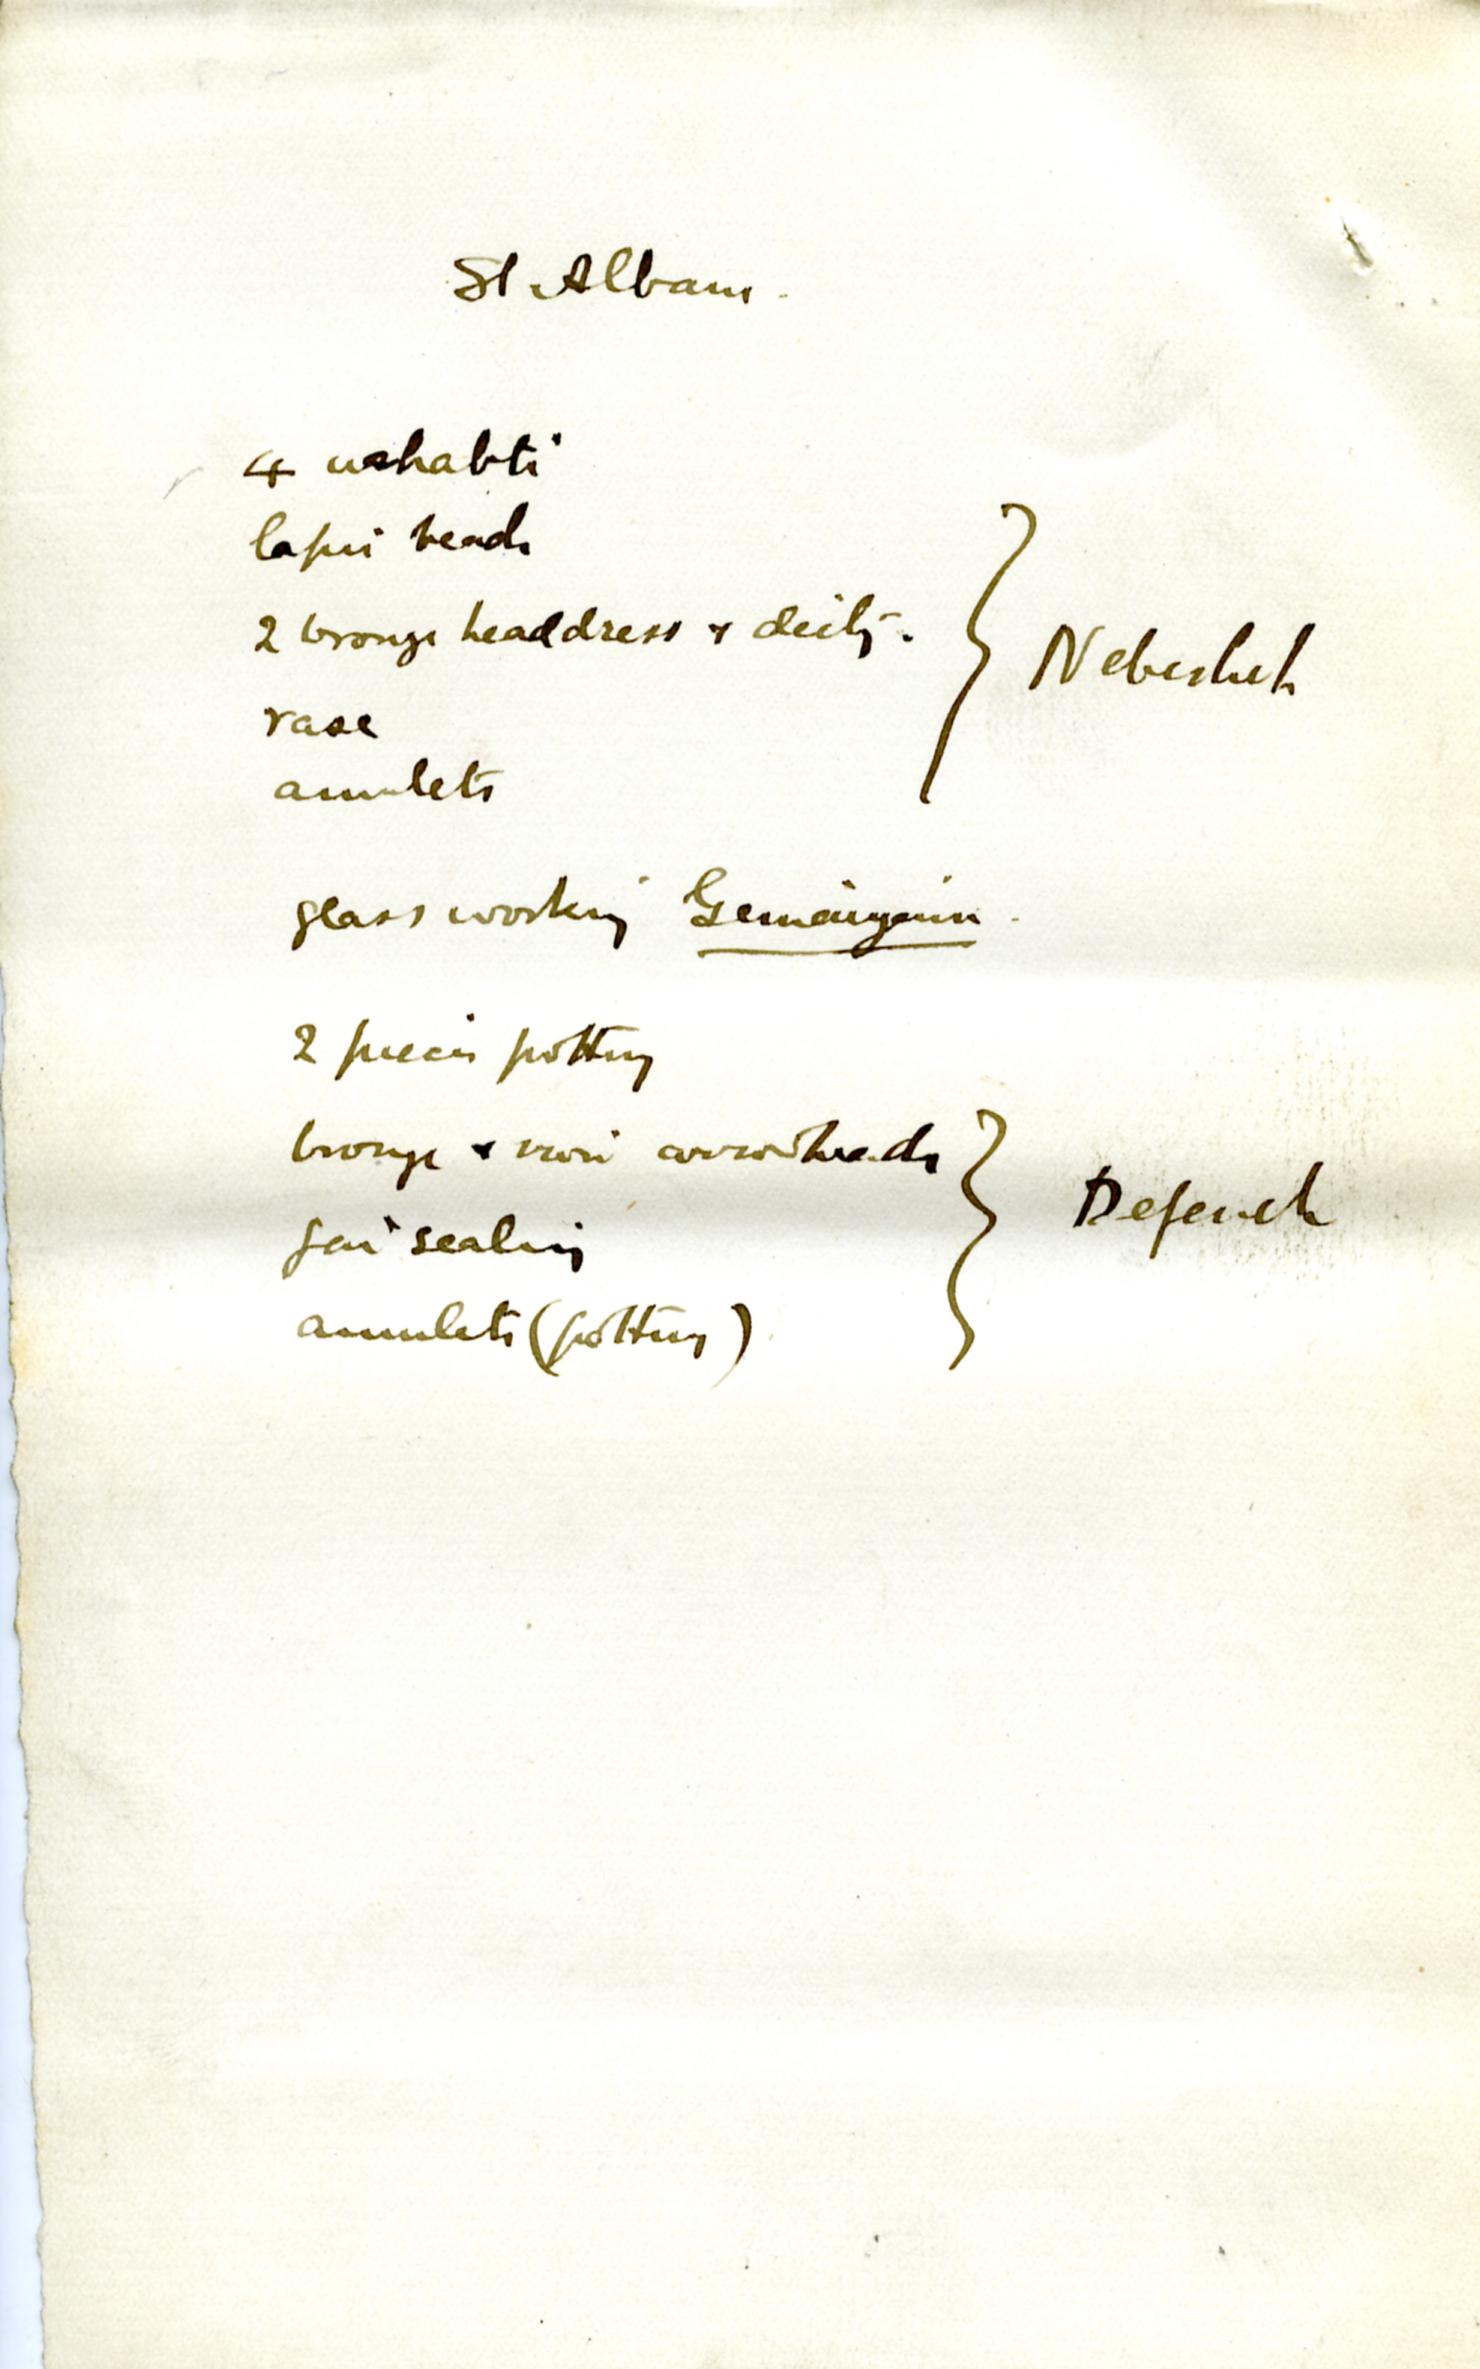 1886 Nebesheh Tell Dafana 1884 el-Qantara, Tell Gemayemi, Tell Sueilin DIST.09.09g